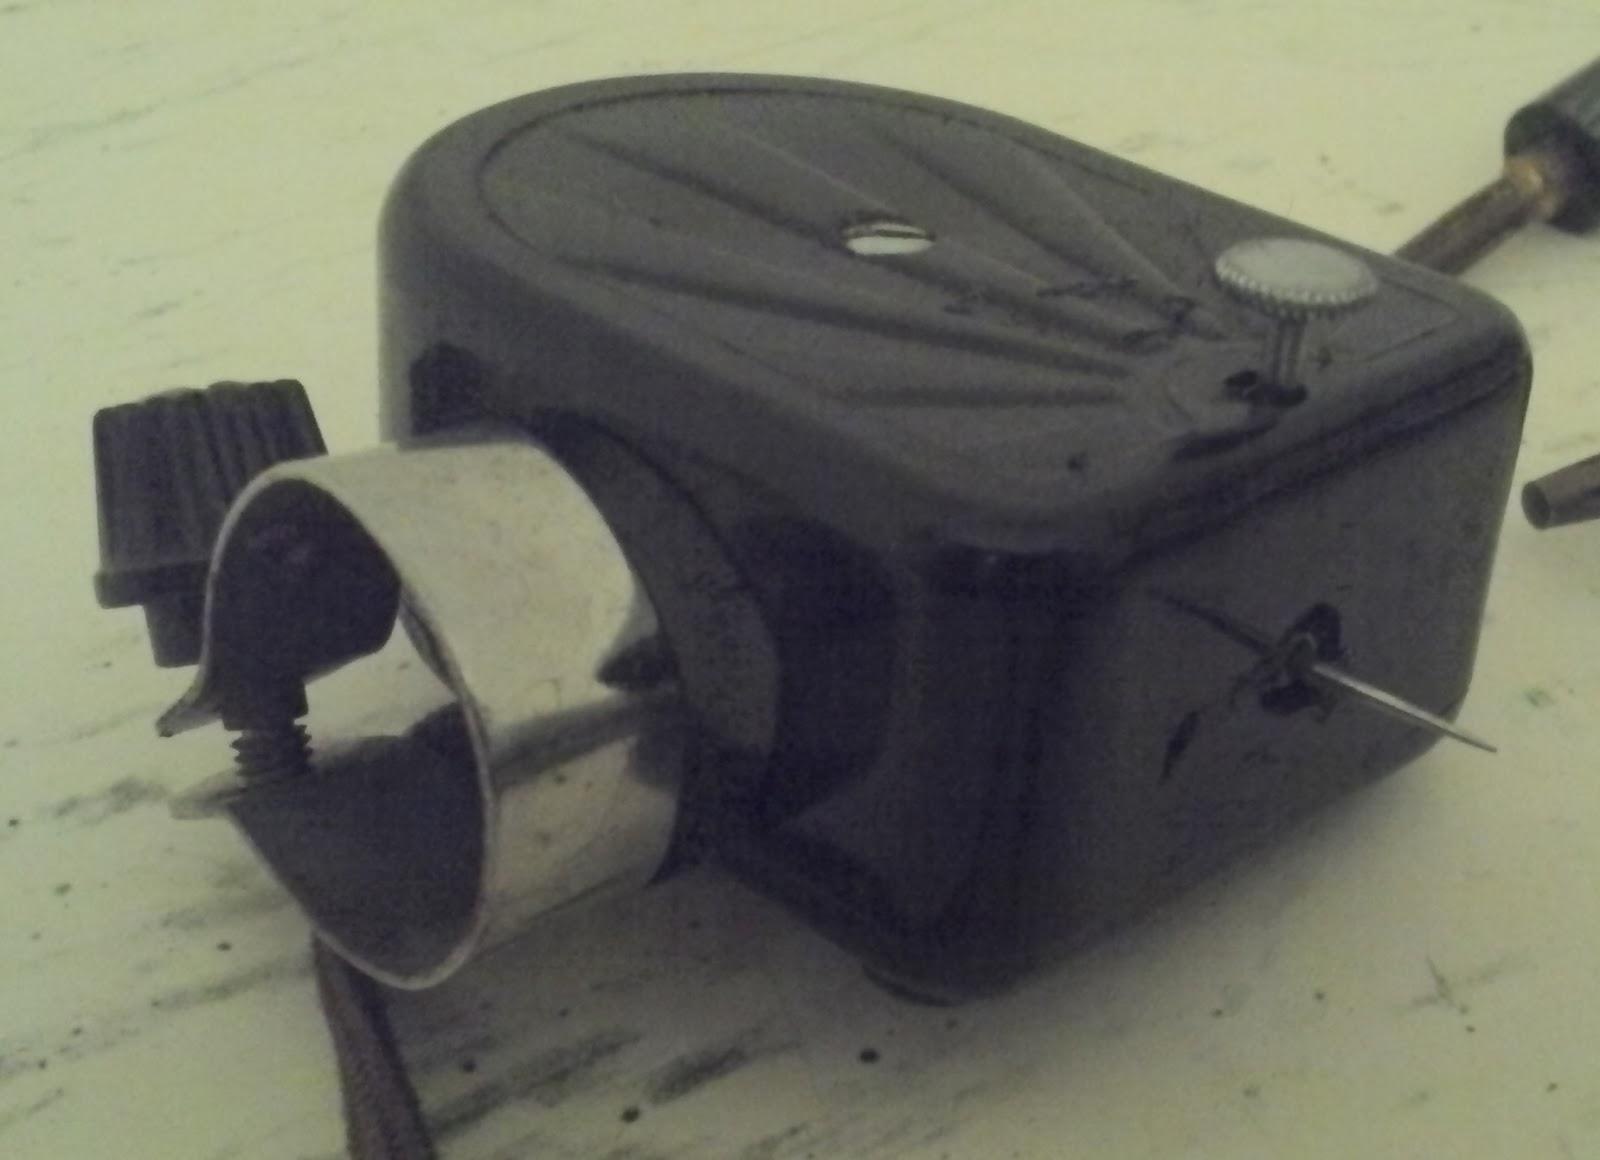 ancien adaptateur bakelite reproducteur gramophone tete de reproduction. Black Bedroom Furniture Sets. Home Design Ideas